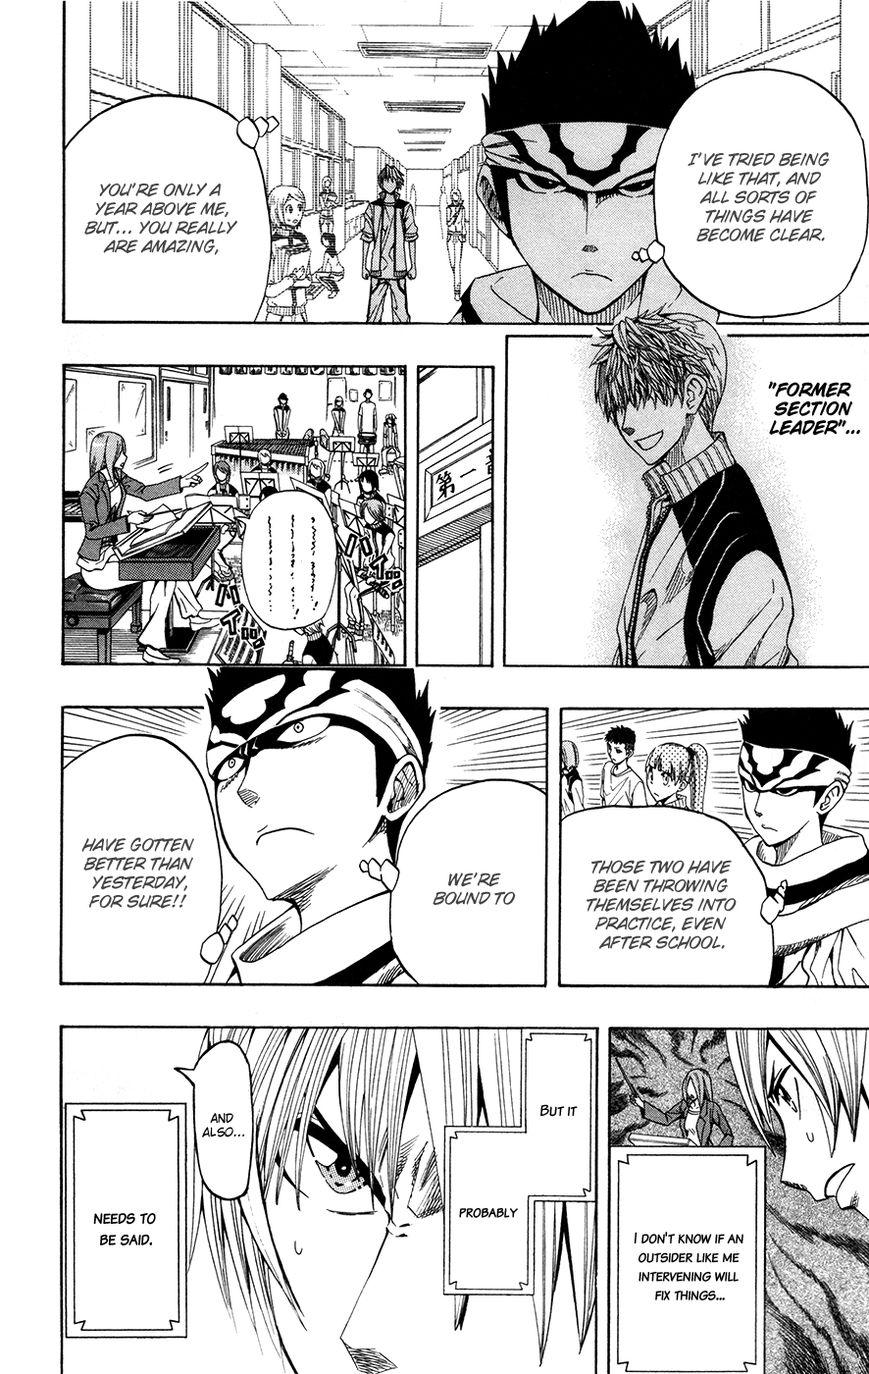 Soul Catcher(S) 4 Page 2